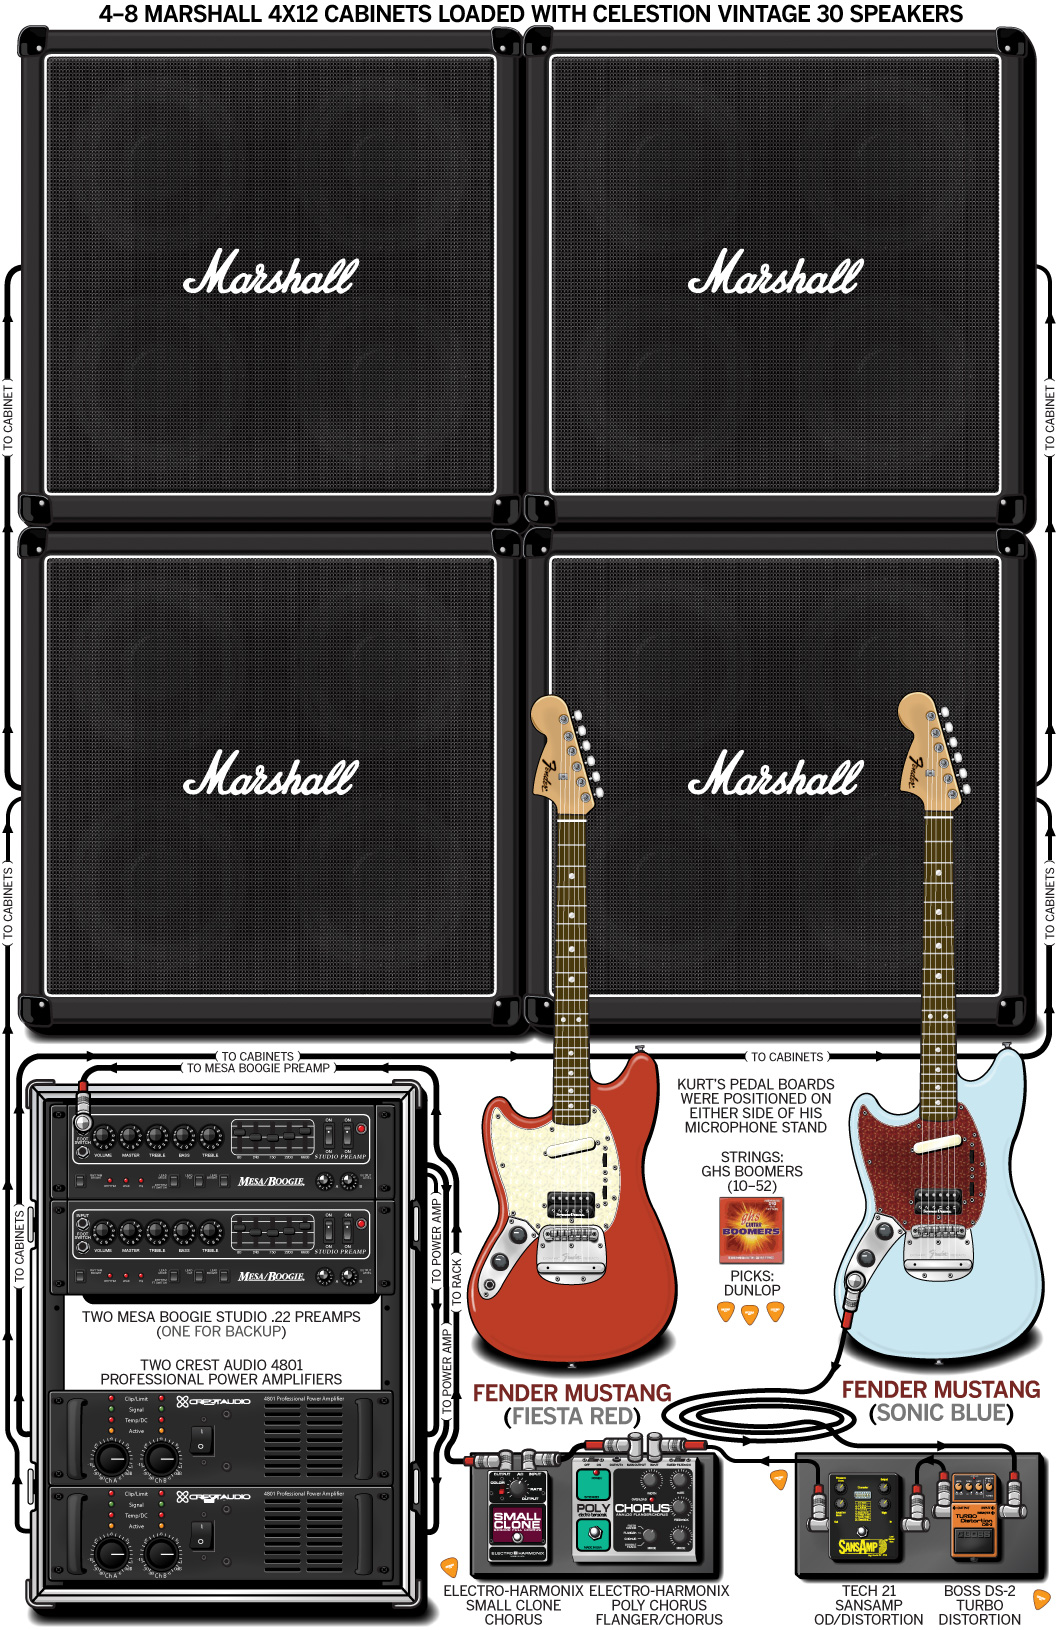 25 Creative Guitar Playing Tips For Beginners Chalk Strings Diagram Kurt Cobain Rig